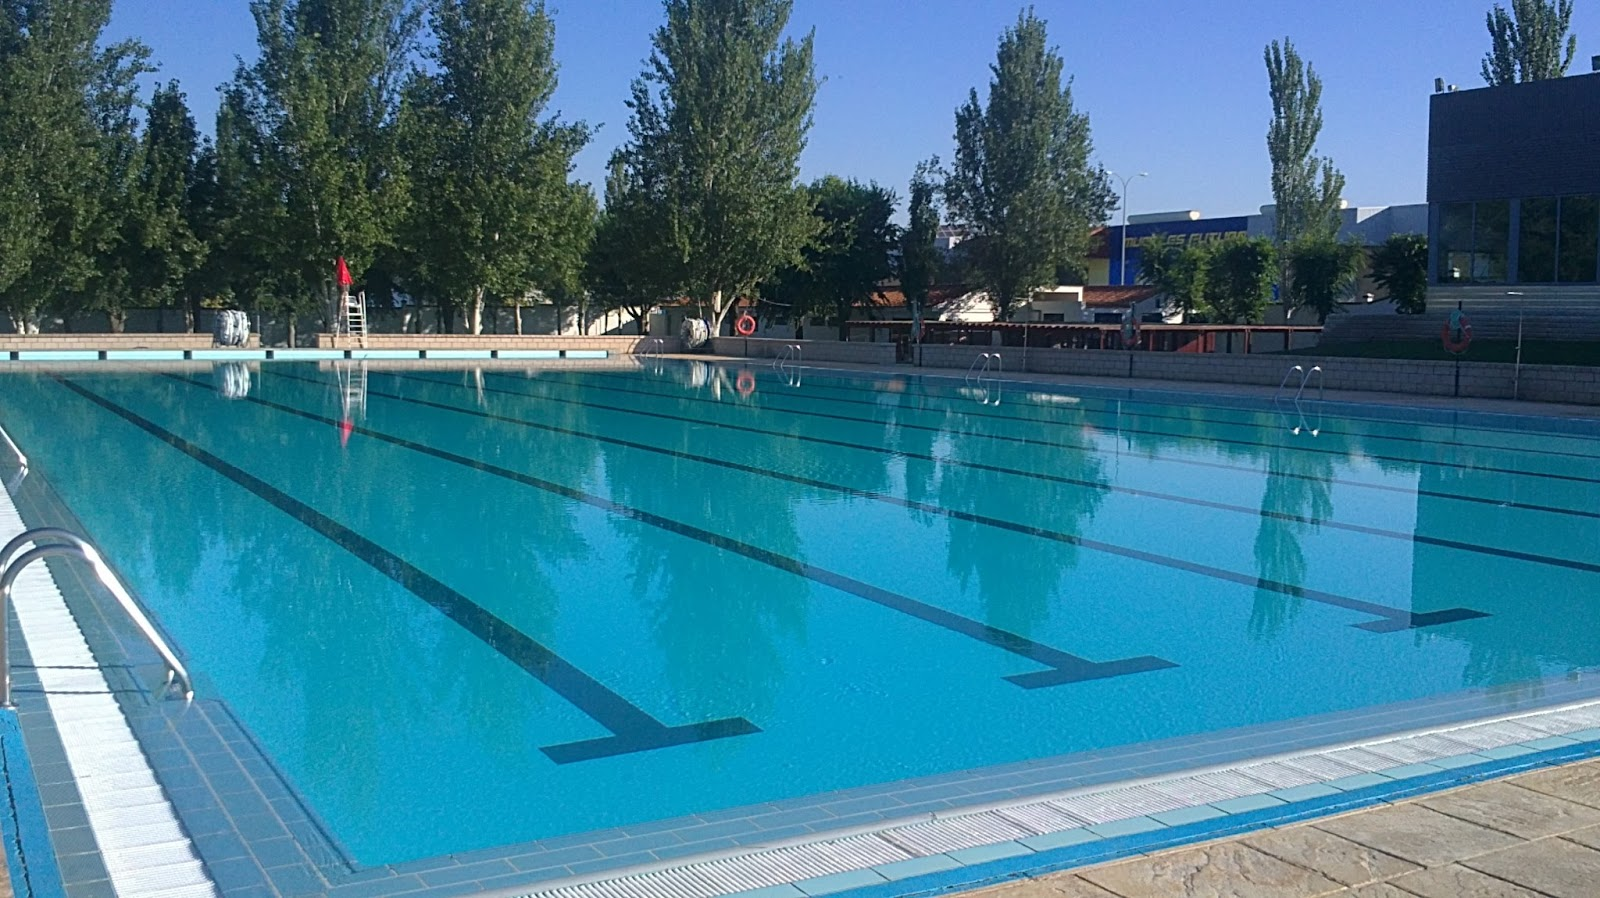 zafra ciudad deportiva piscina municipal de verano